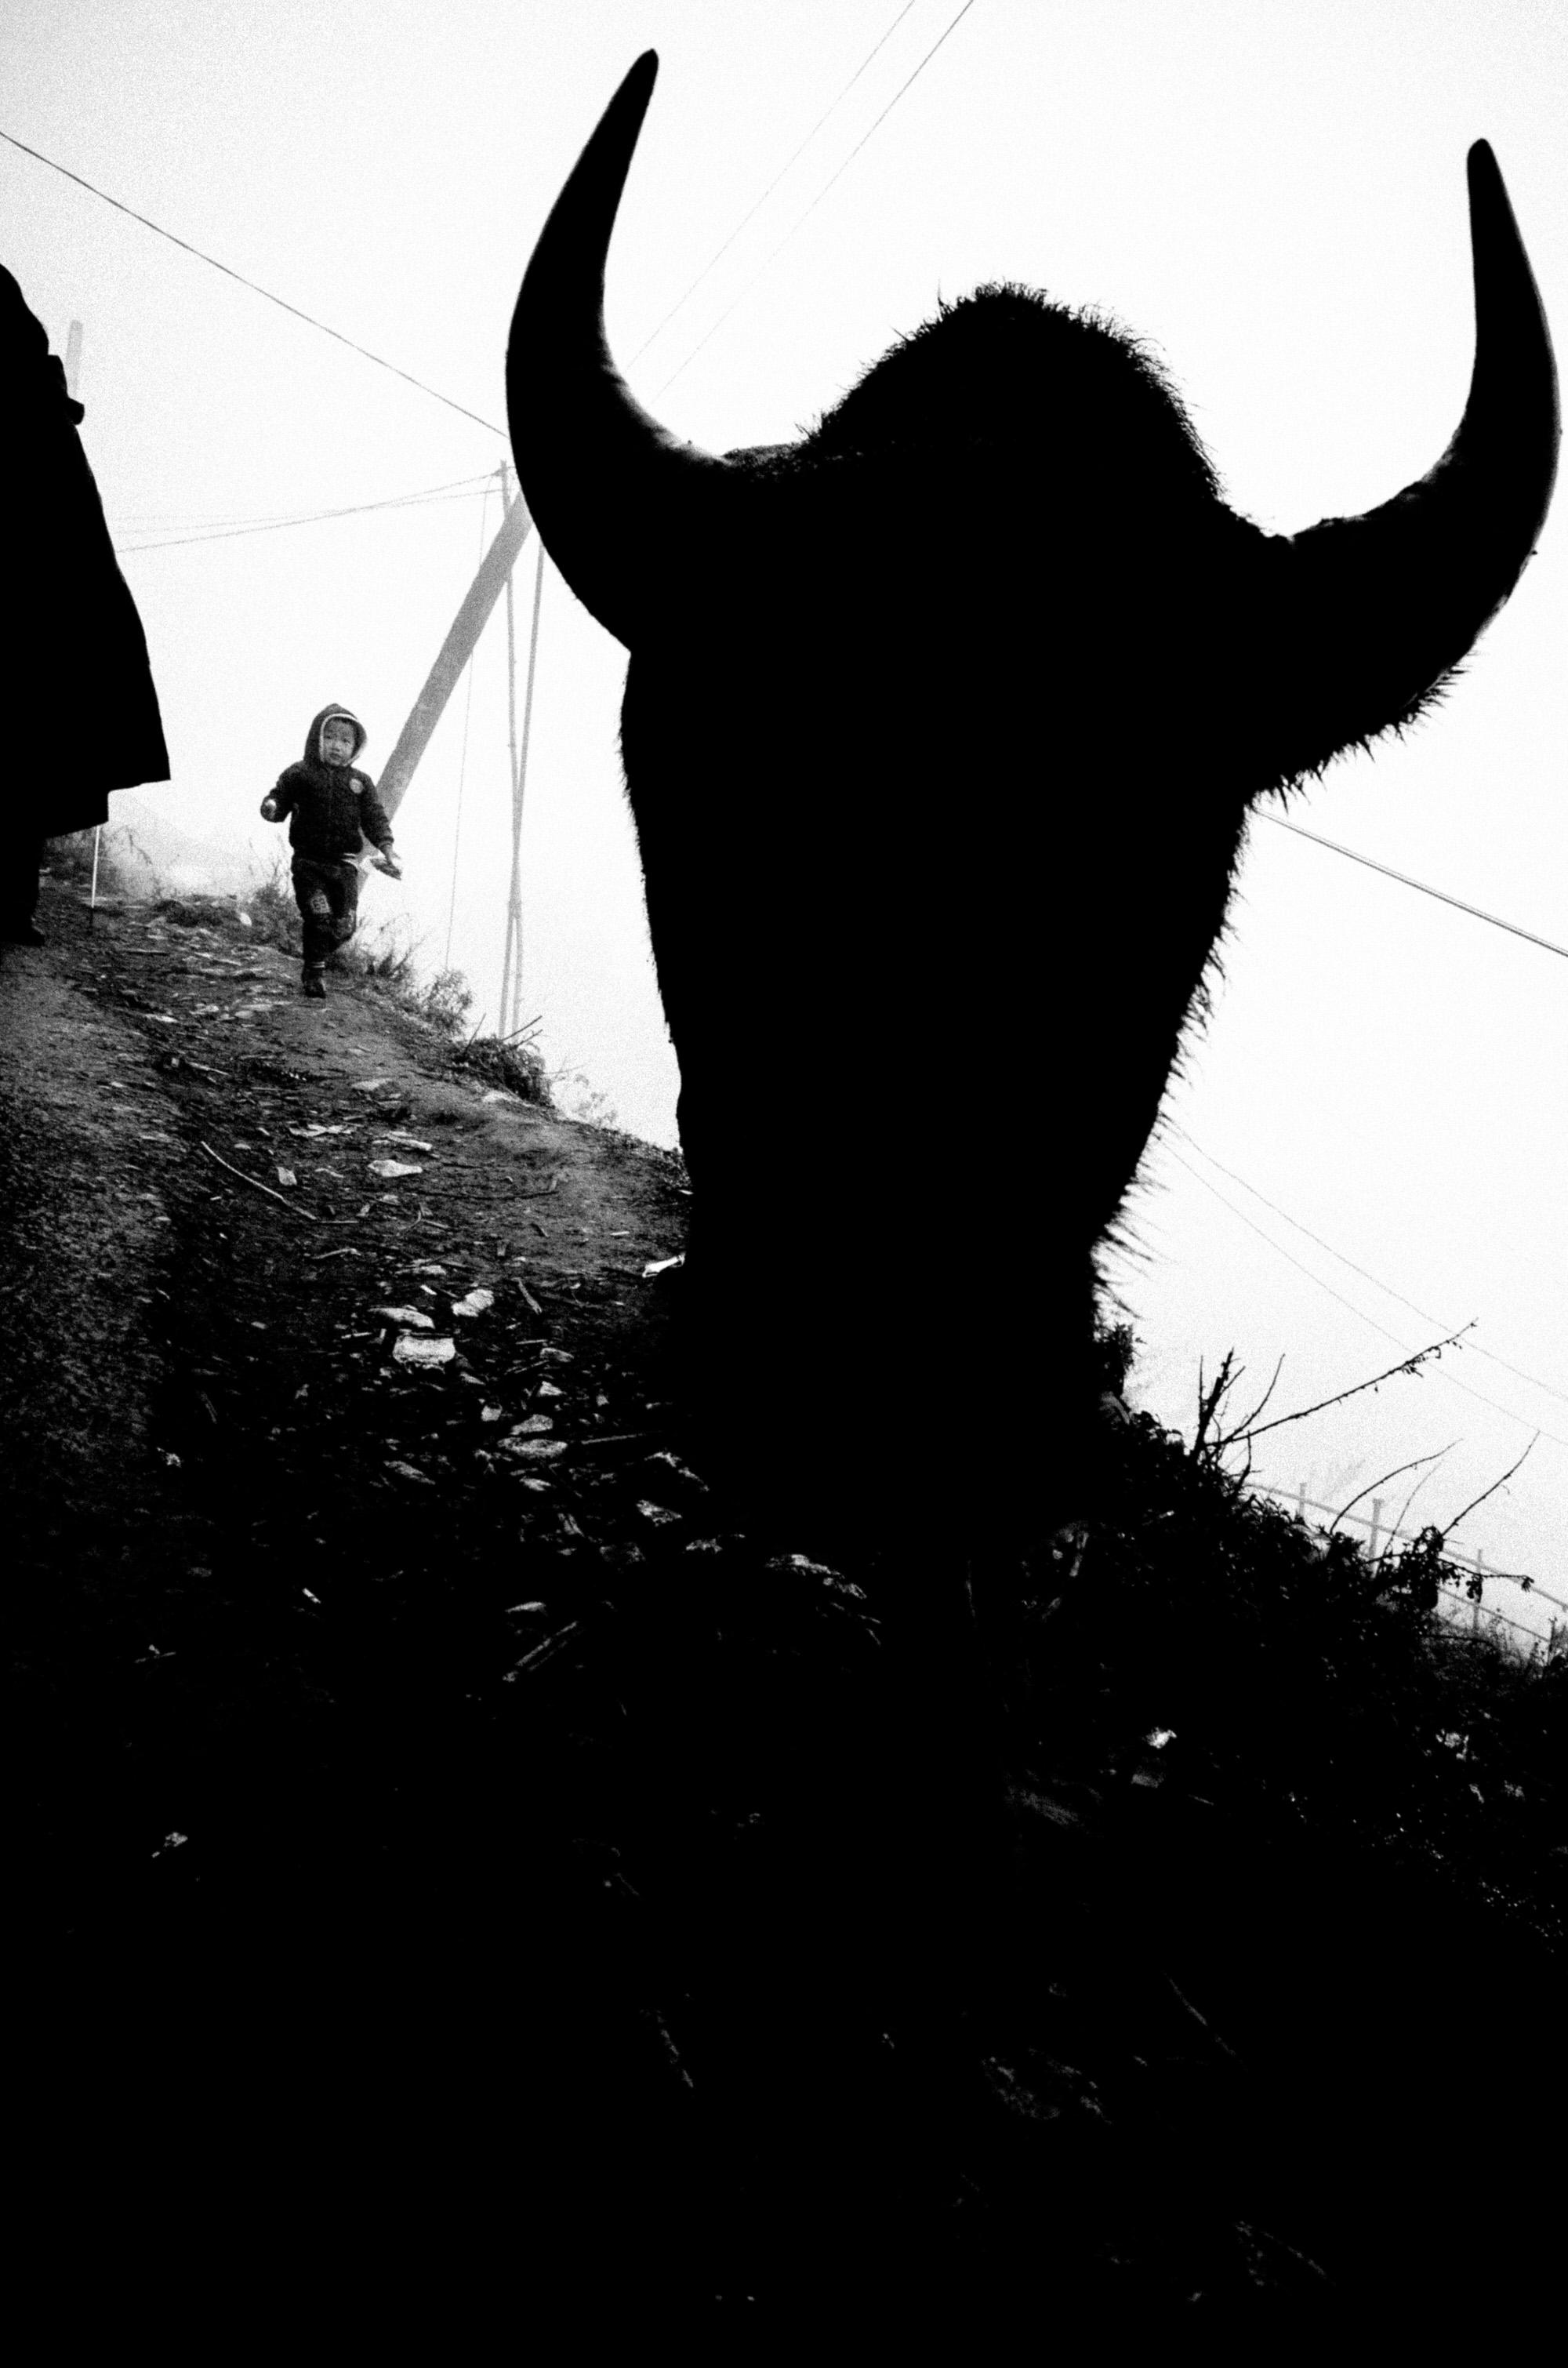 eric kim street photography -sapa-0006247.jpg